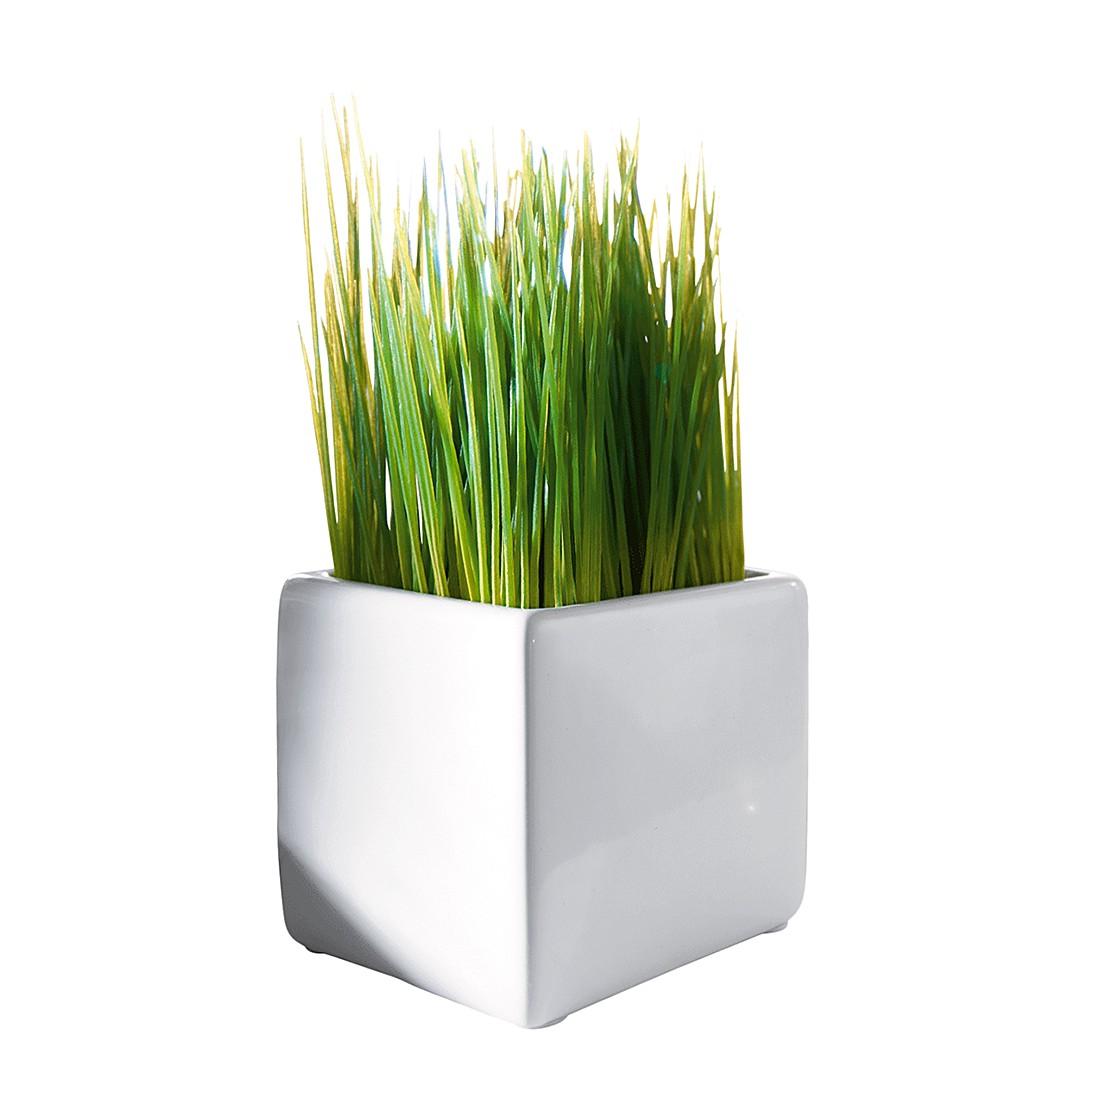 Dekogras im Keramiktopf – Kunststoff – Weiß/Grün, PureDay günstig kaufen